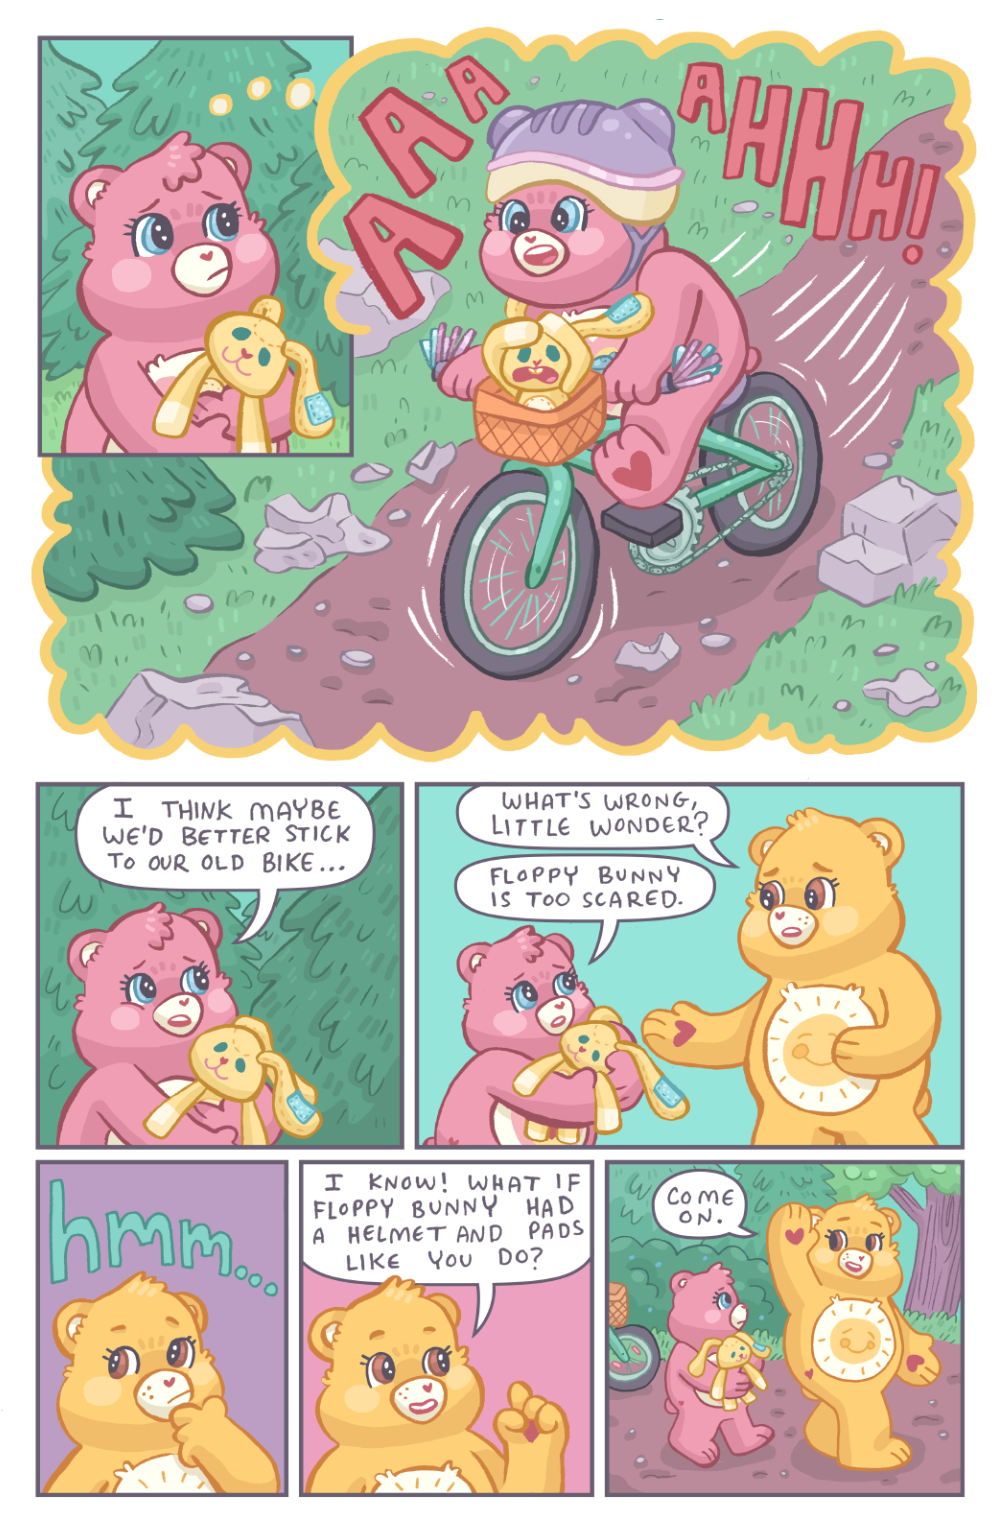 cb-bike-2.png